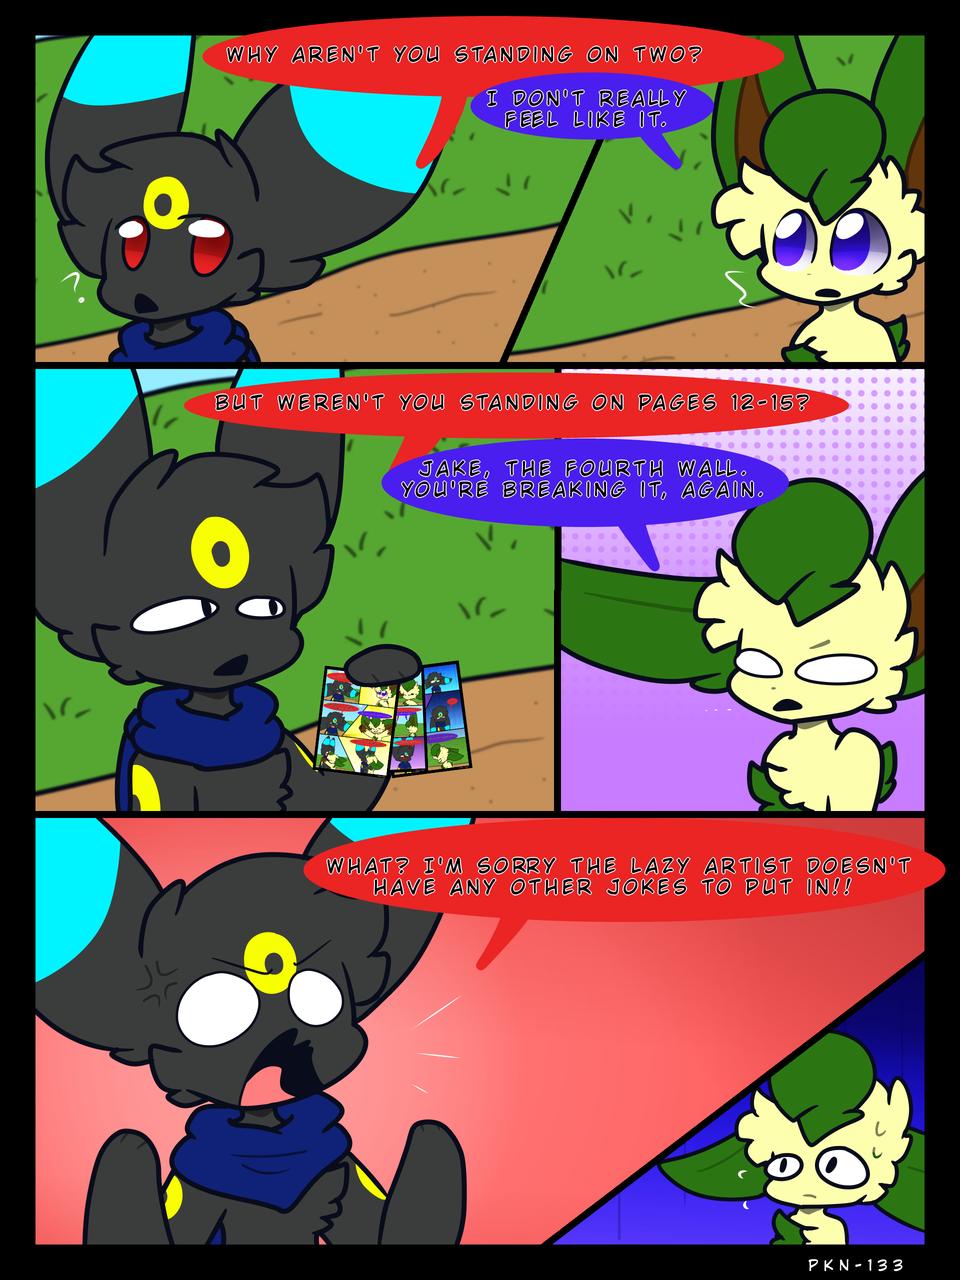 More eevee comick Illust of ✨ PKN-133 ✨ oc Comics Jaketheumbreon pokemon digital PKN-133